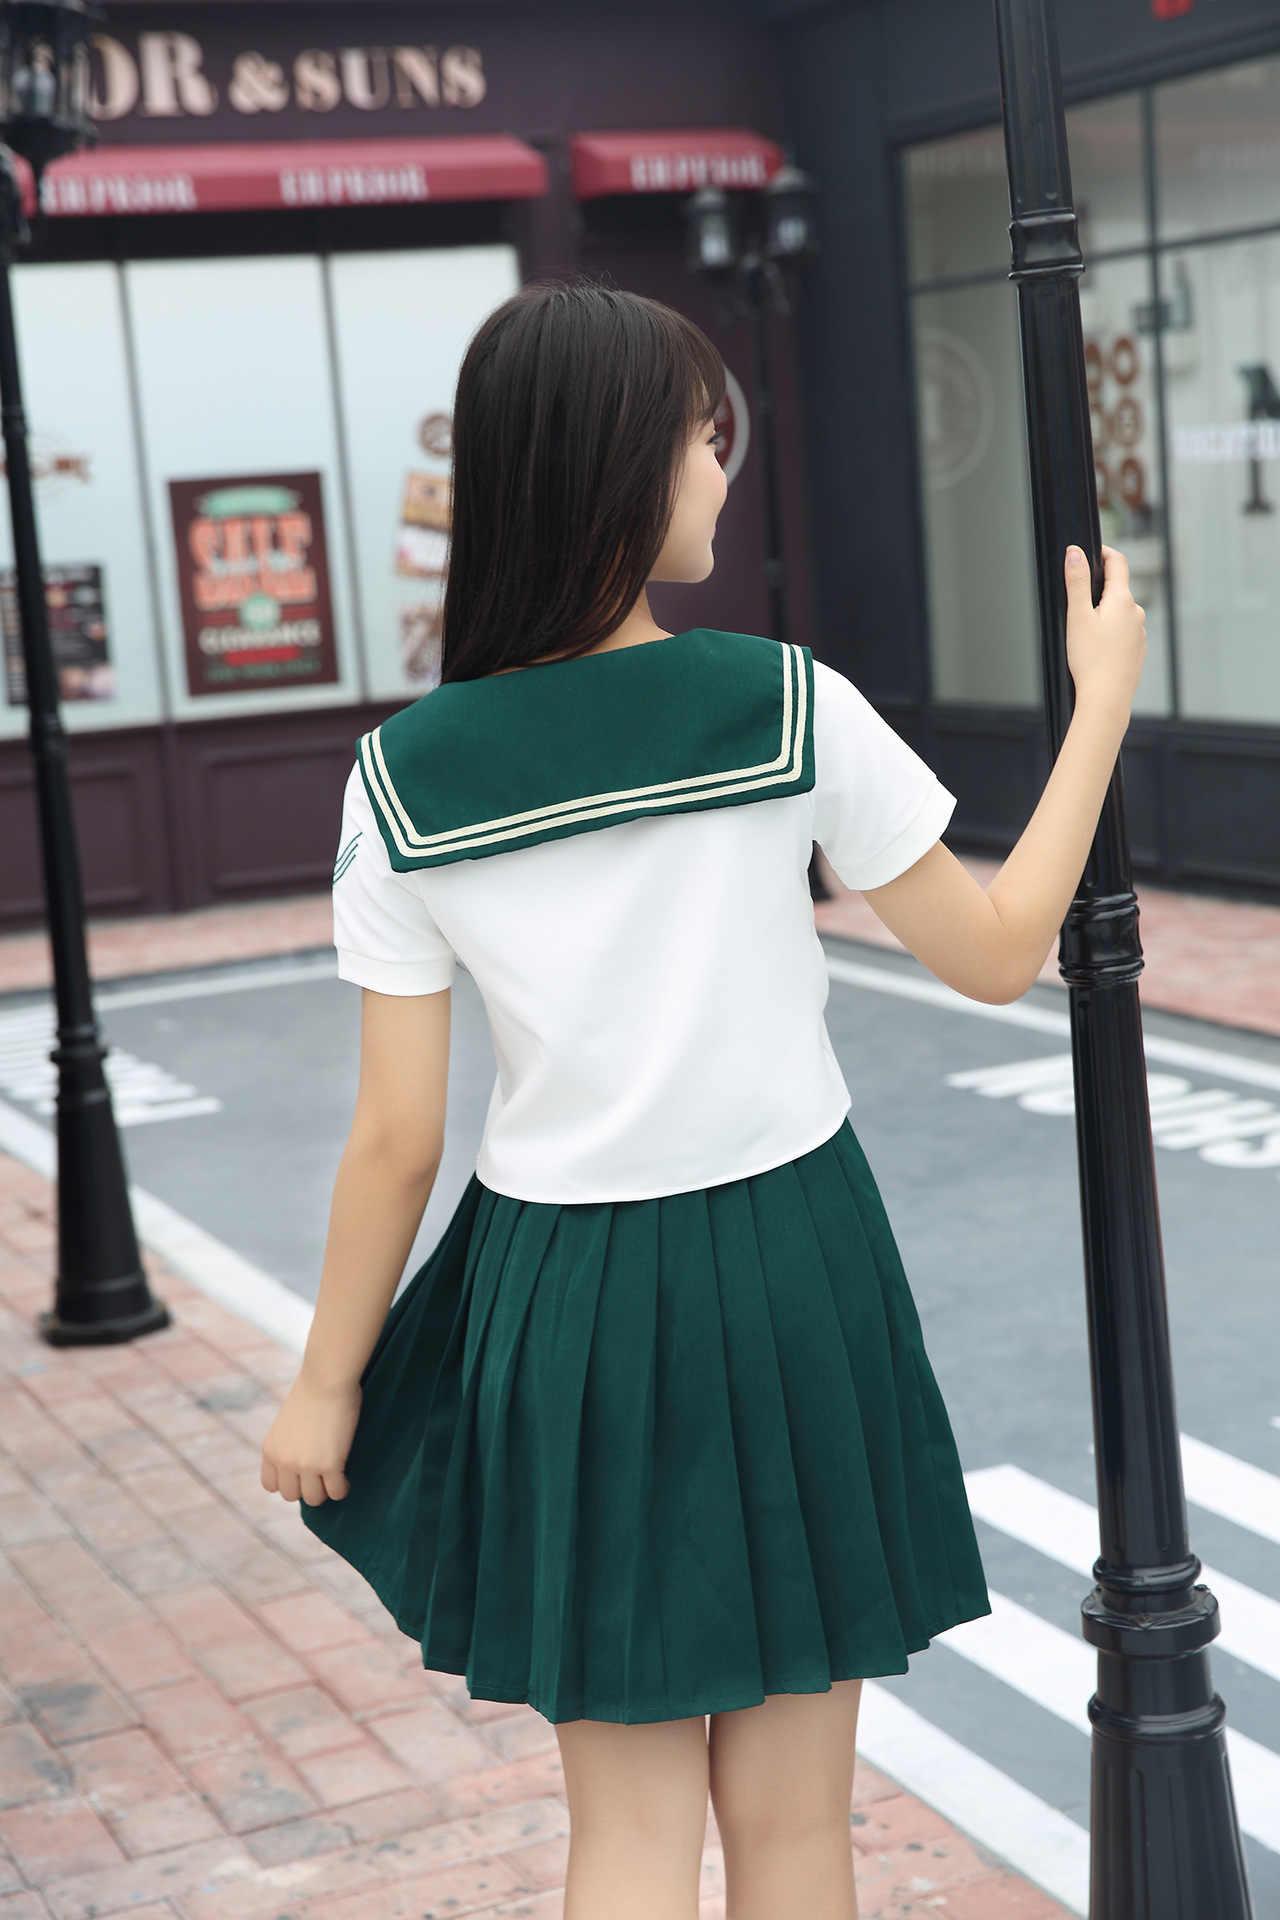 High Quality Girl Japanese Uniform Sailor School Uniform -6210